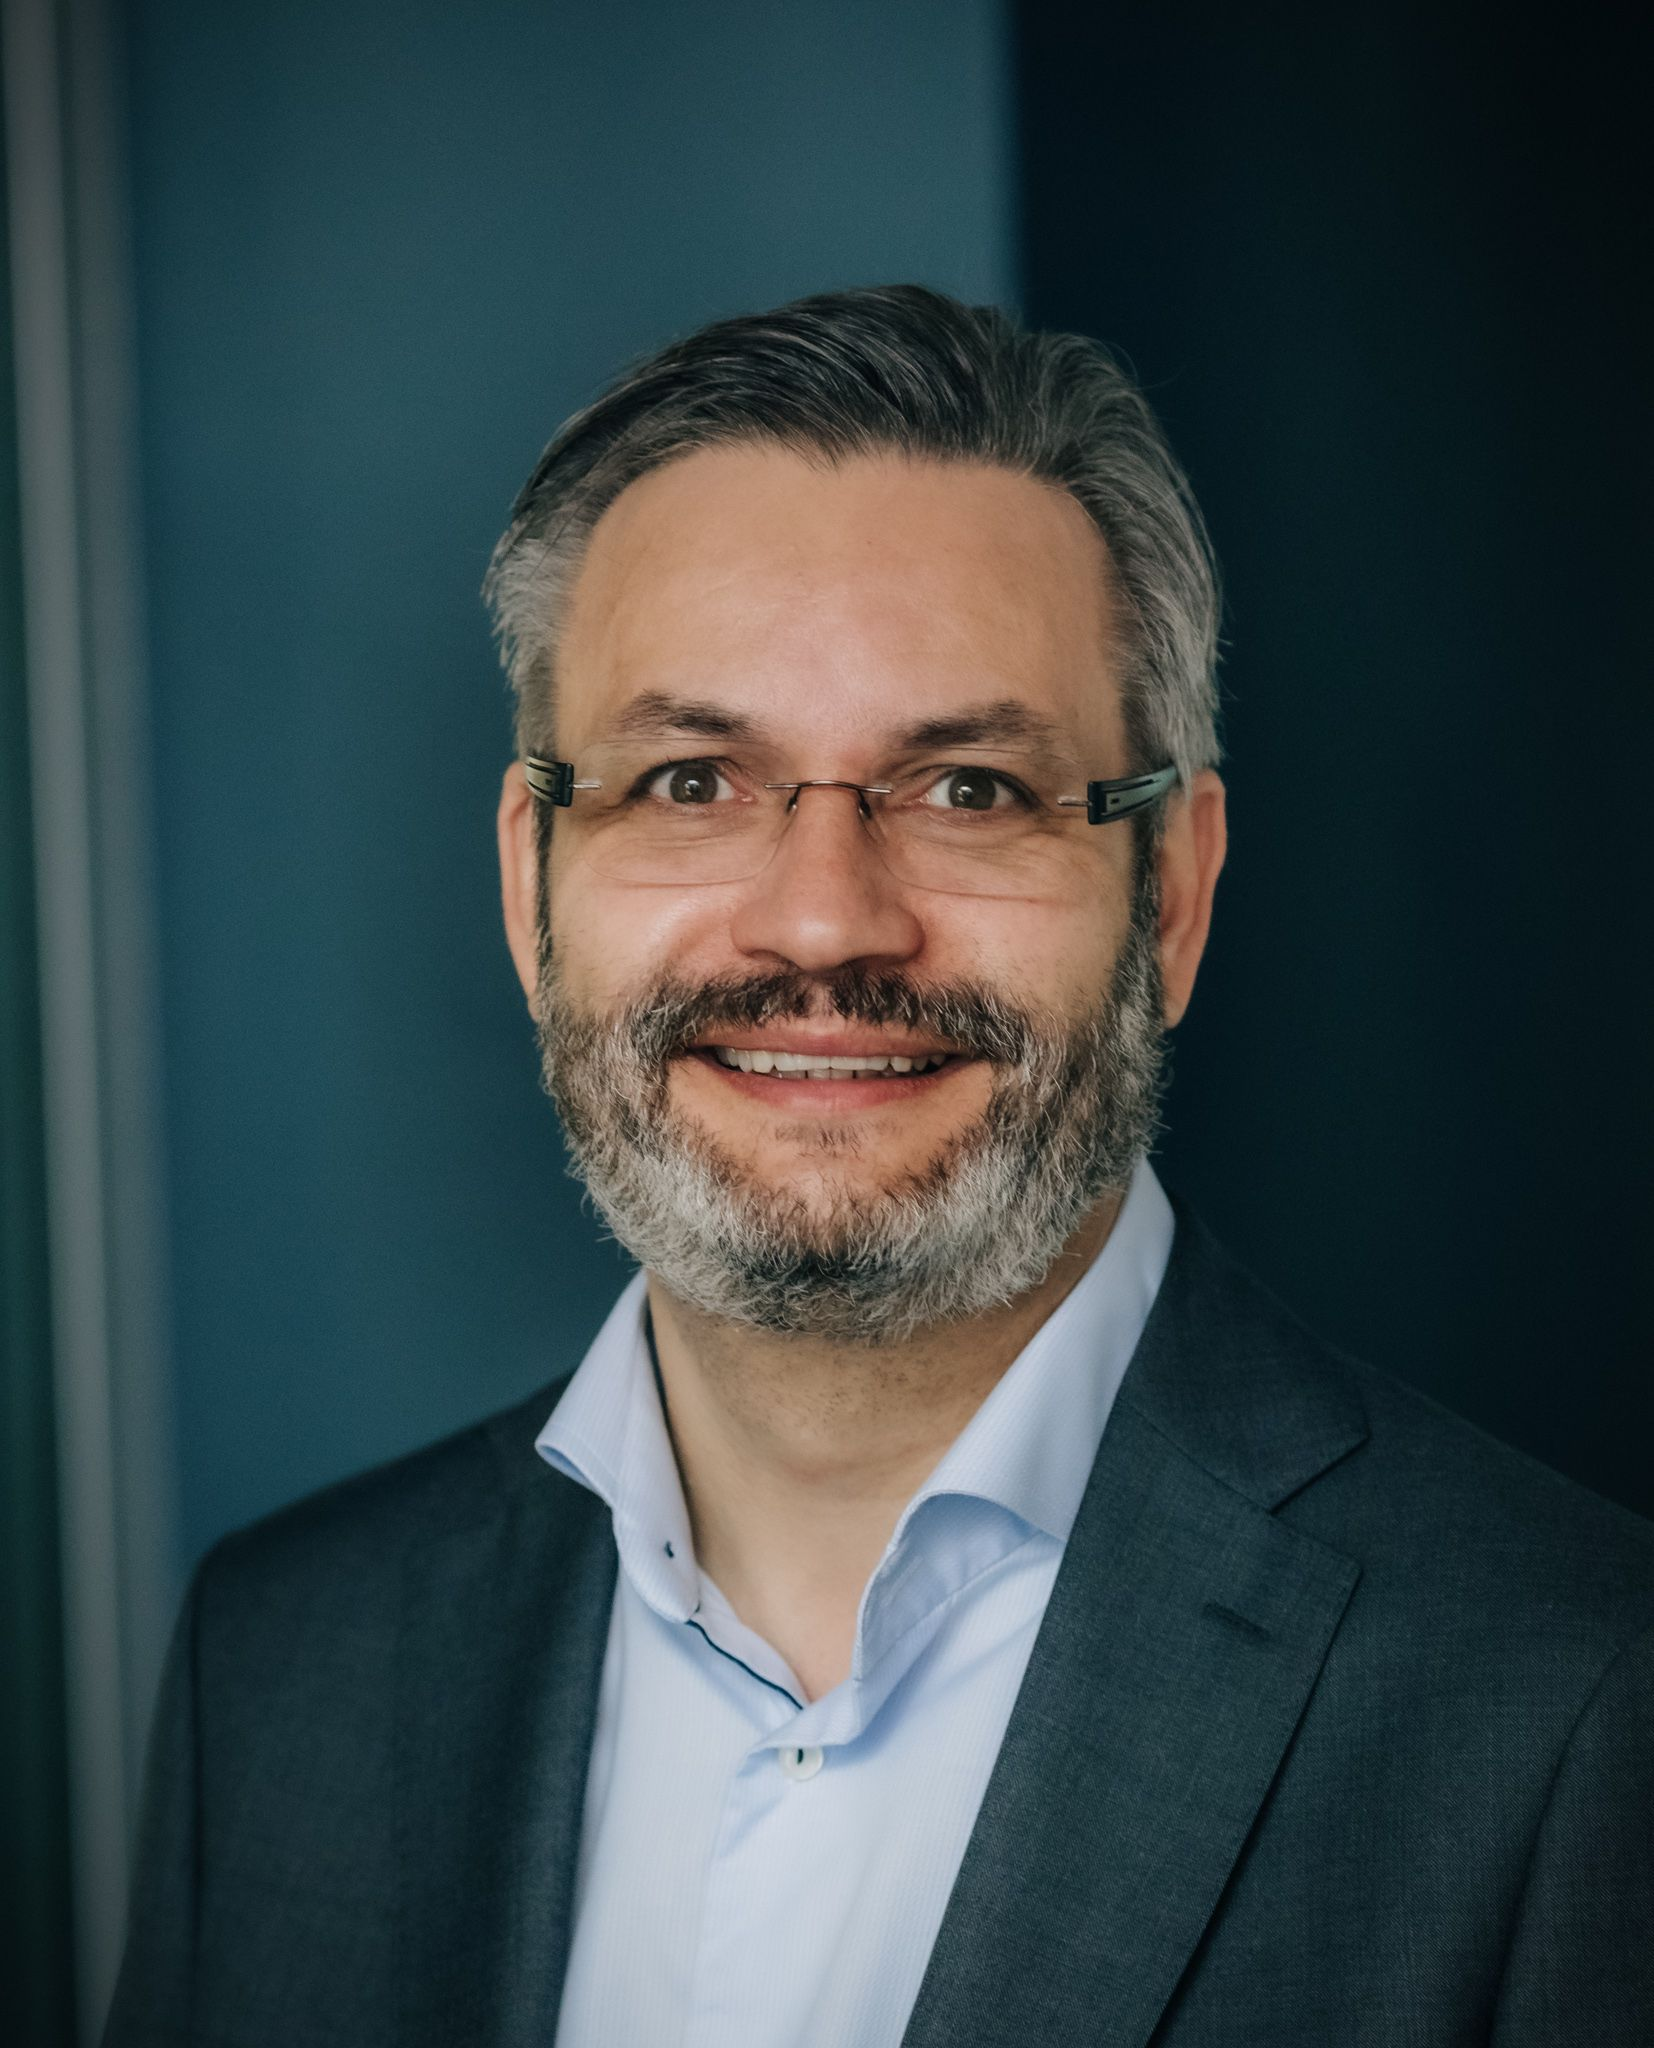 Håkon Taule